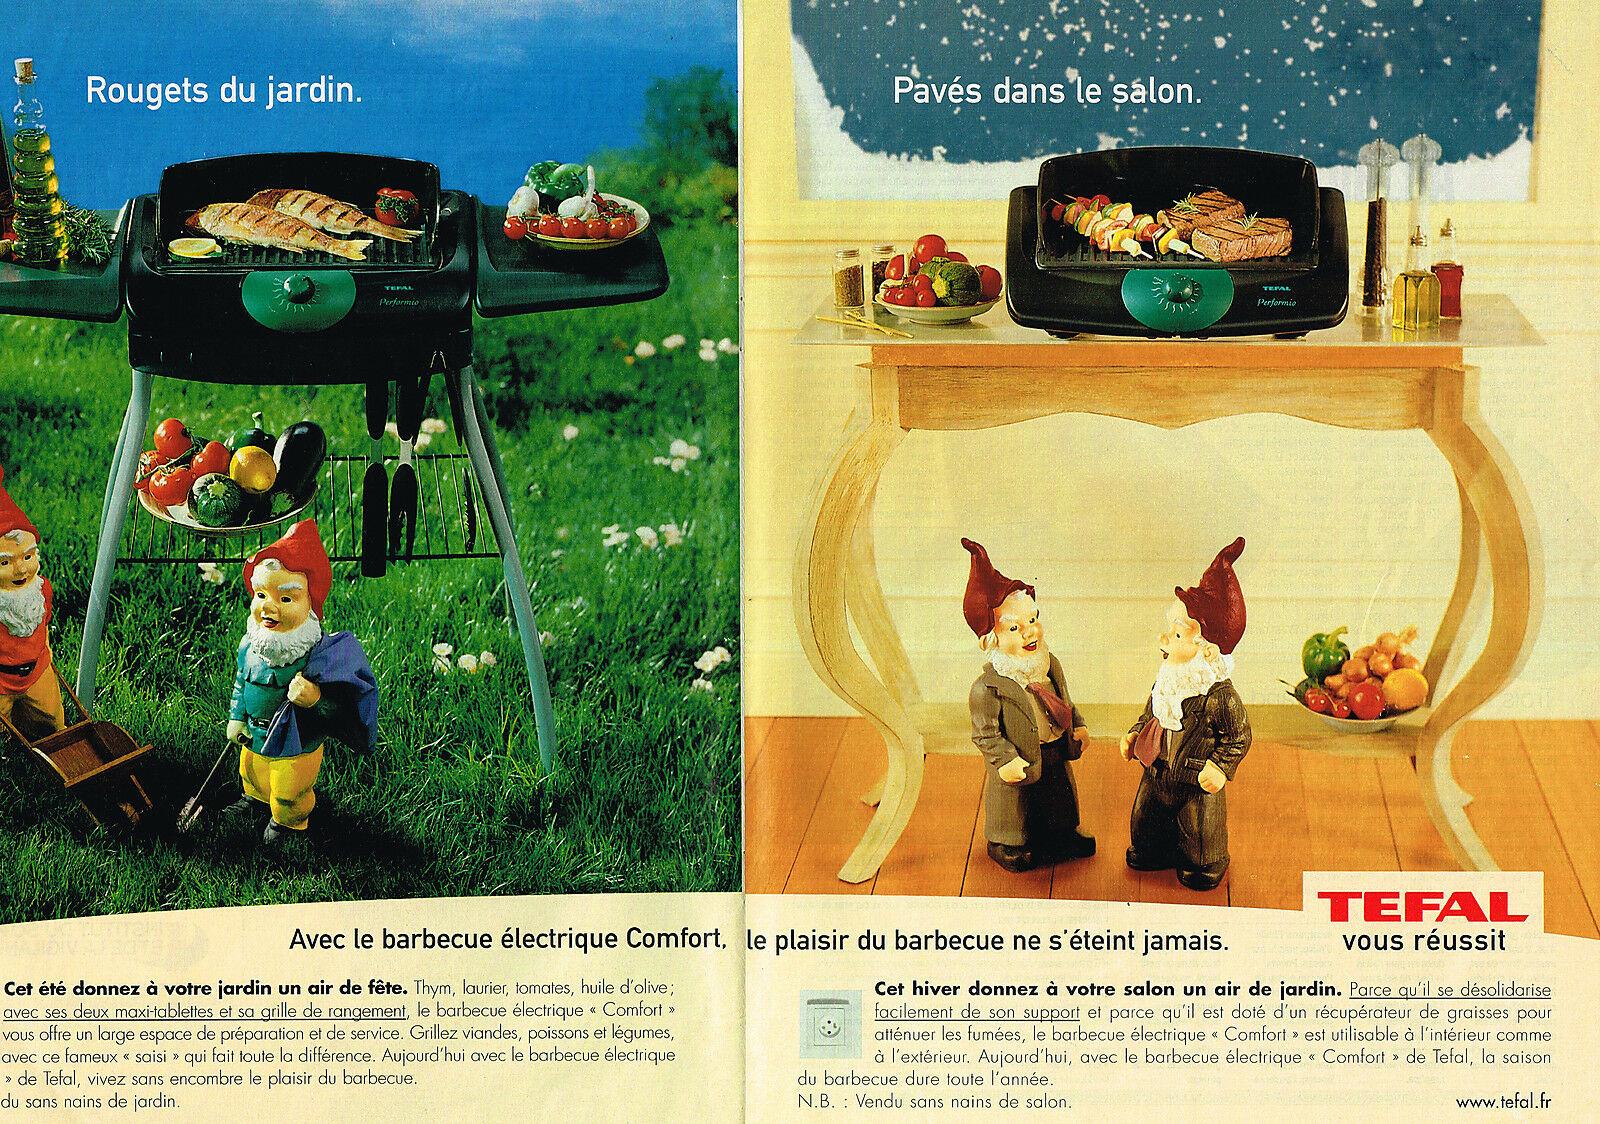 2001 TEFAL barbecue electrique